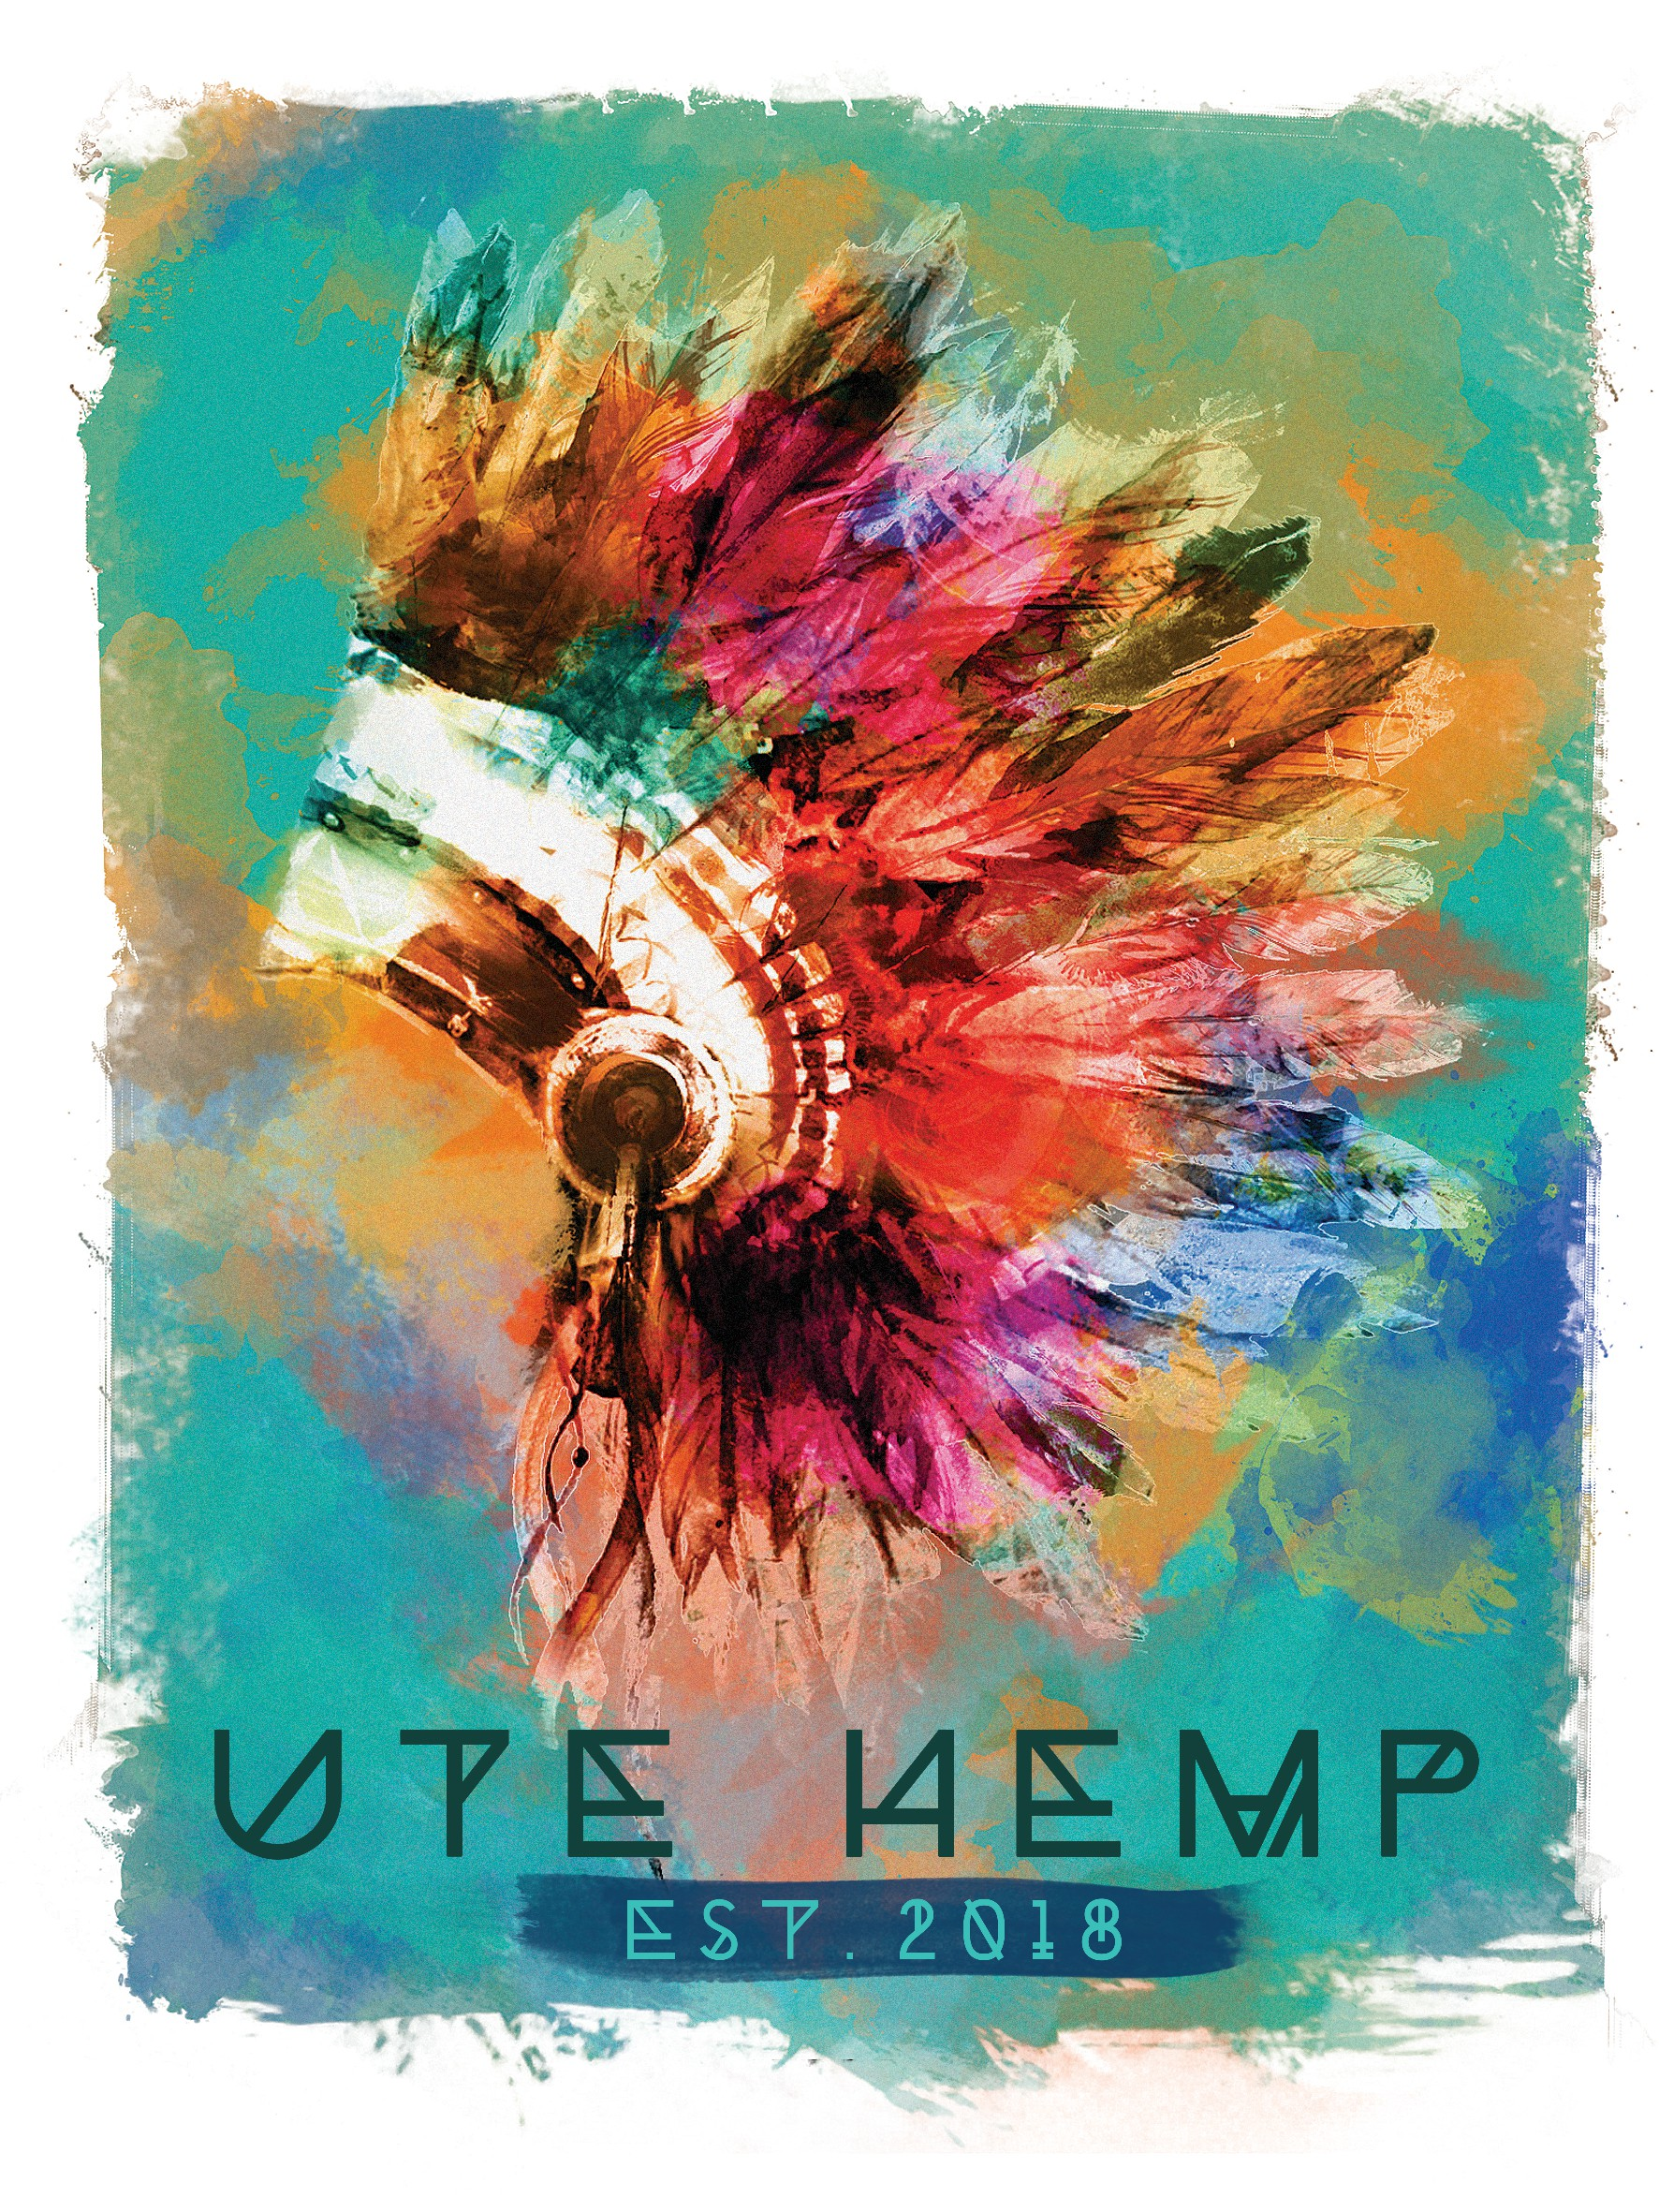 T-Shirt Design Wanted for Native American Hemp/CBD Business